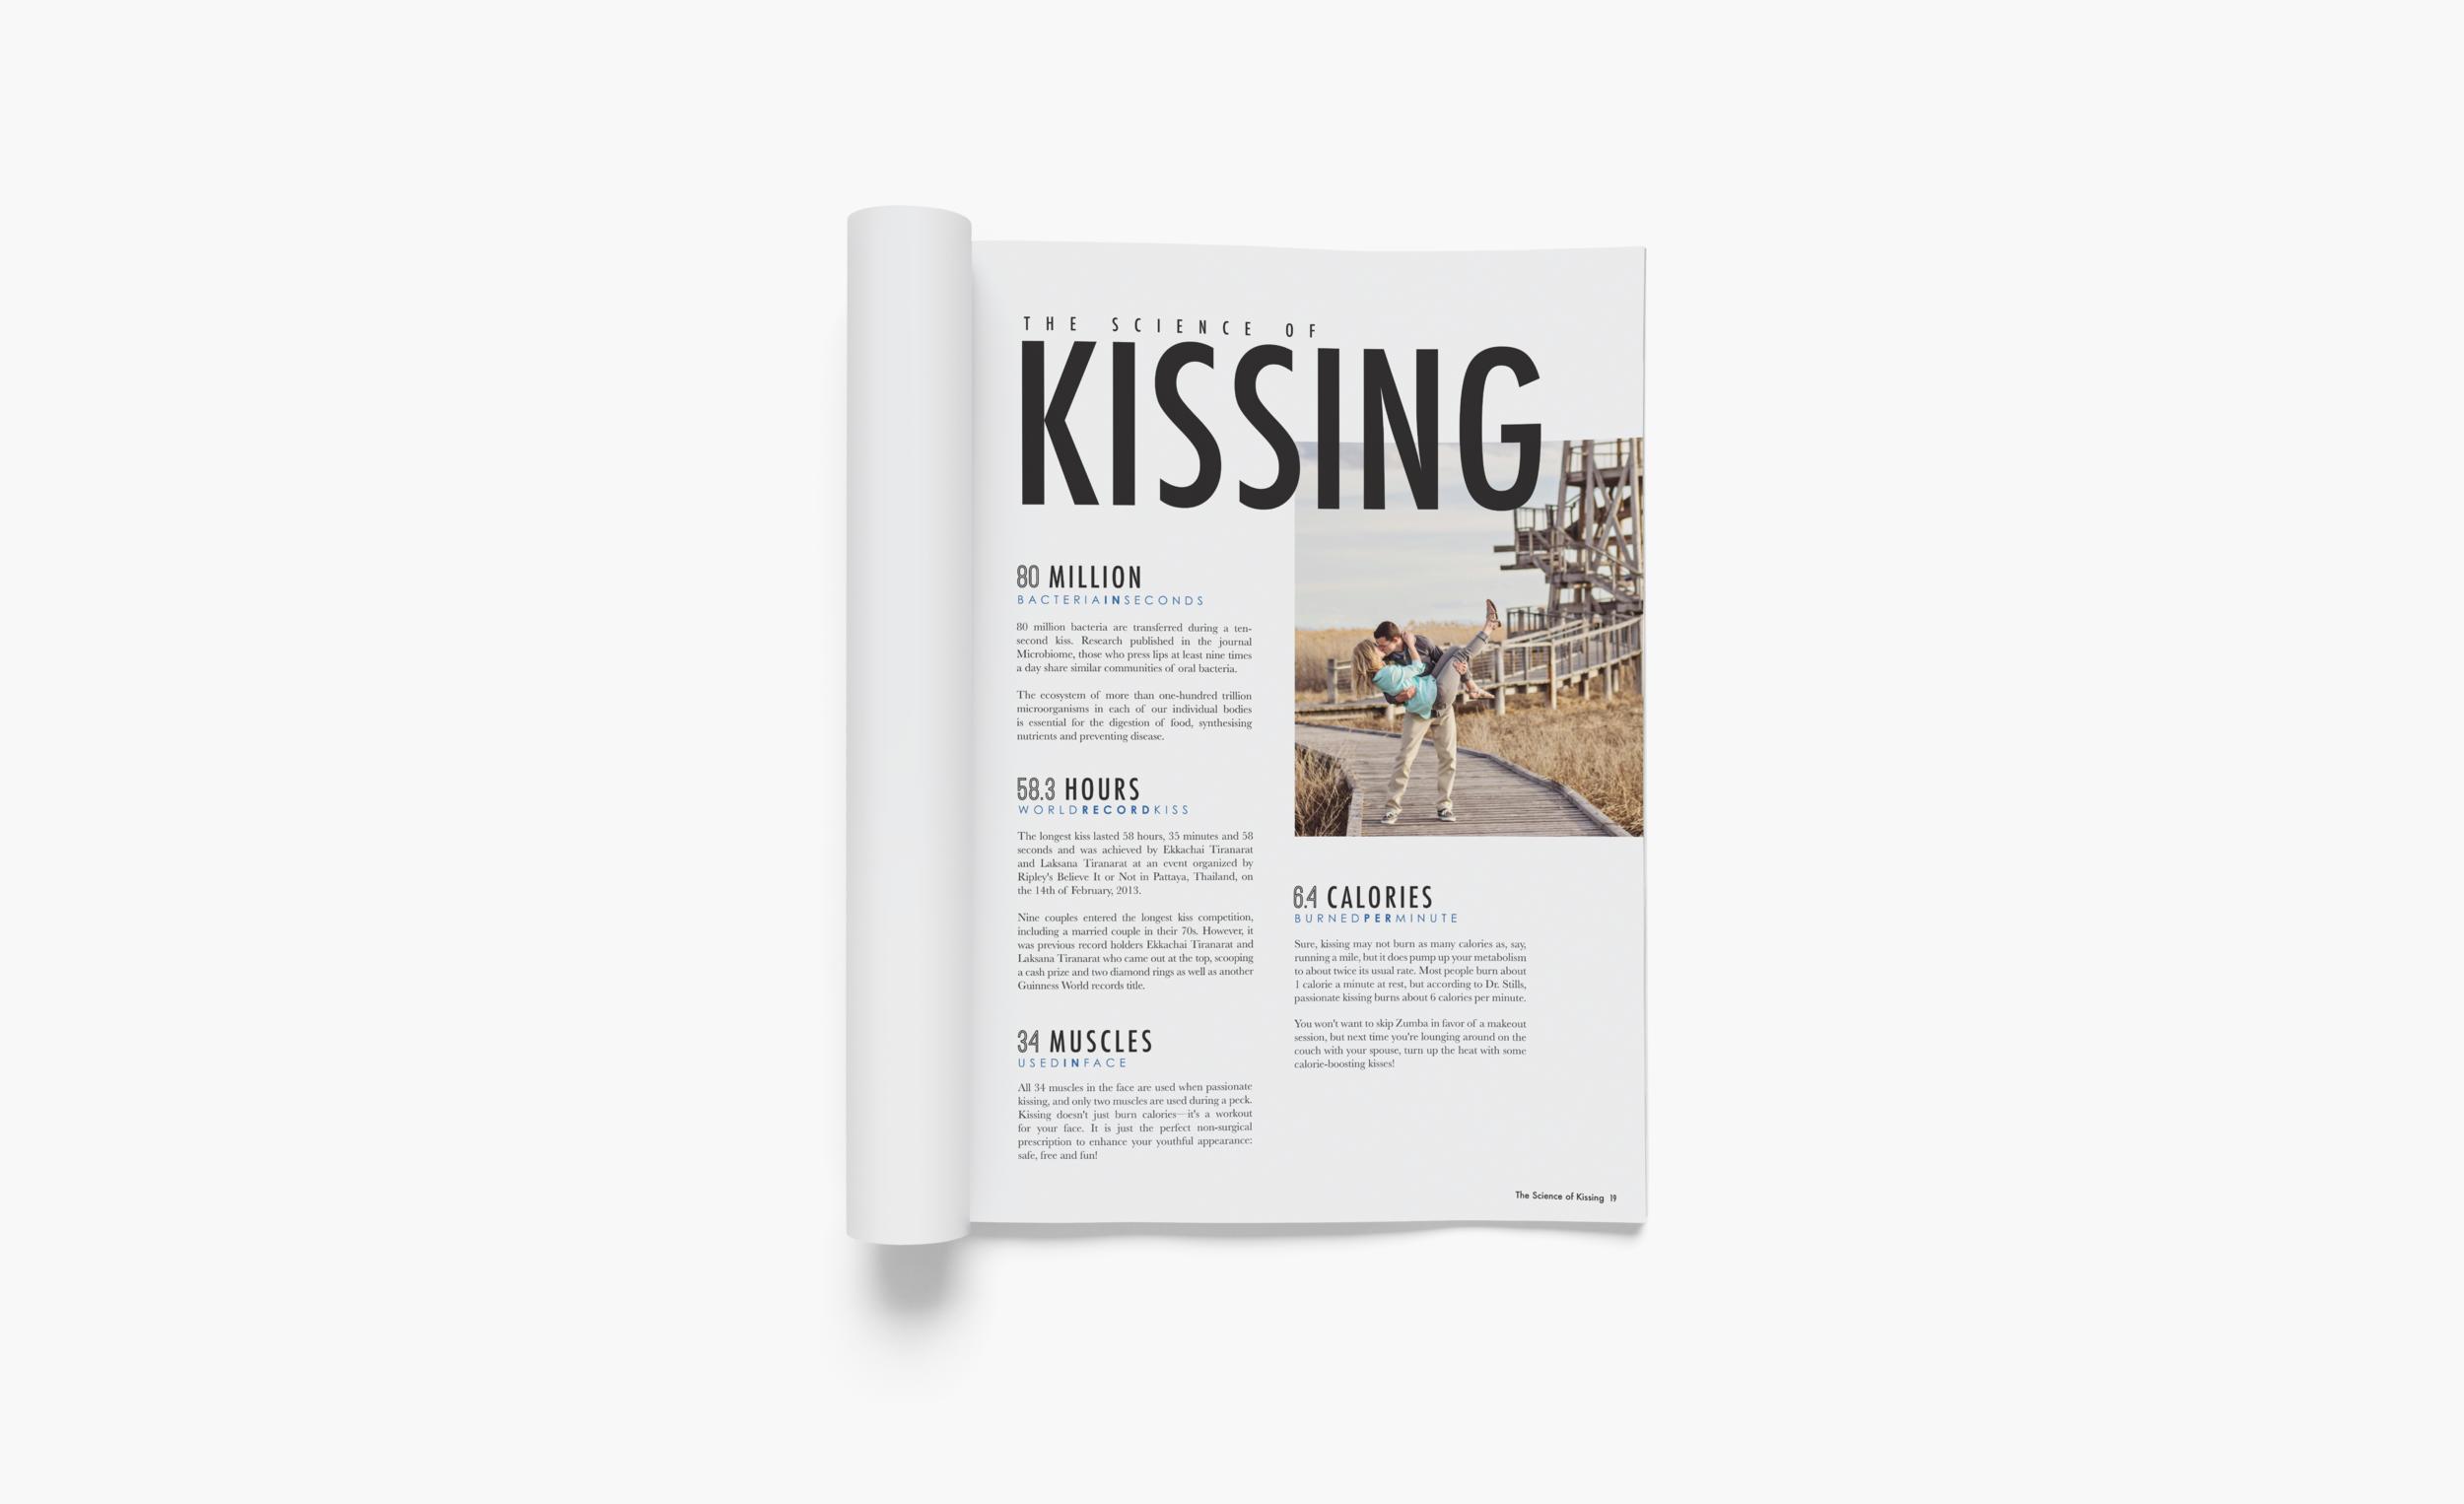 kissing-01.png